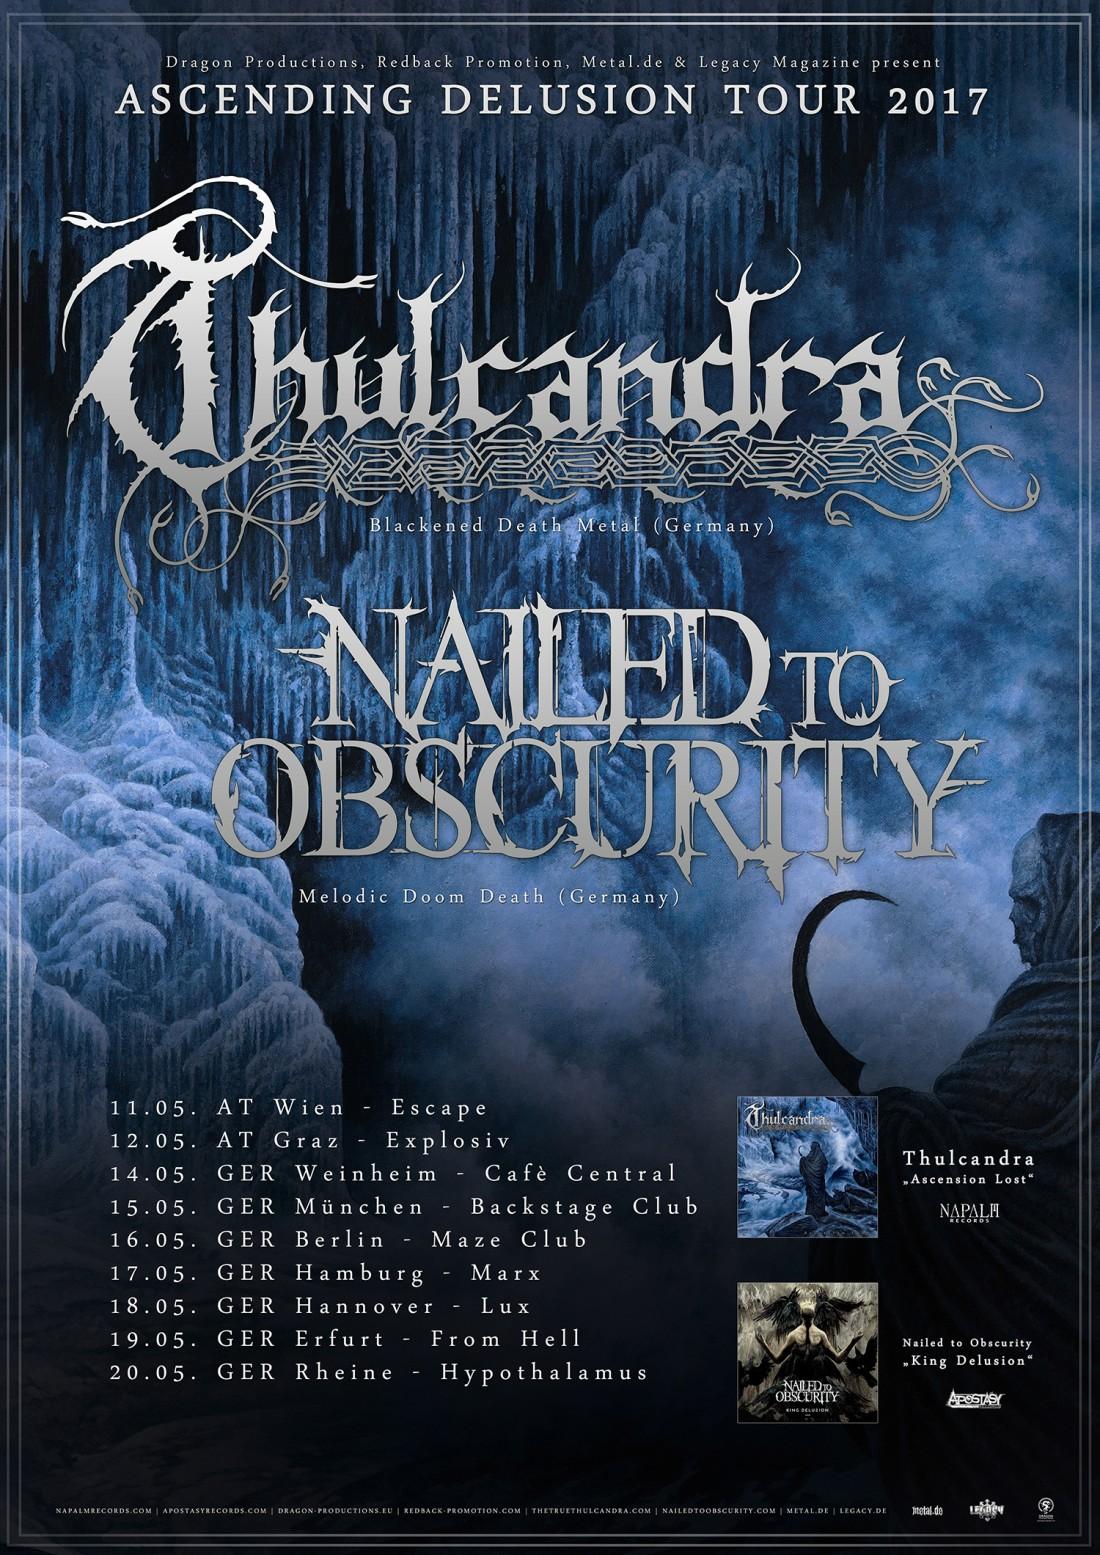 Thulcandra | Ascension to Delusion Tour 2017